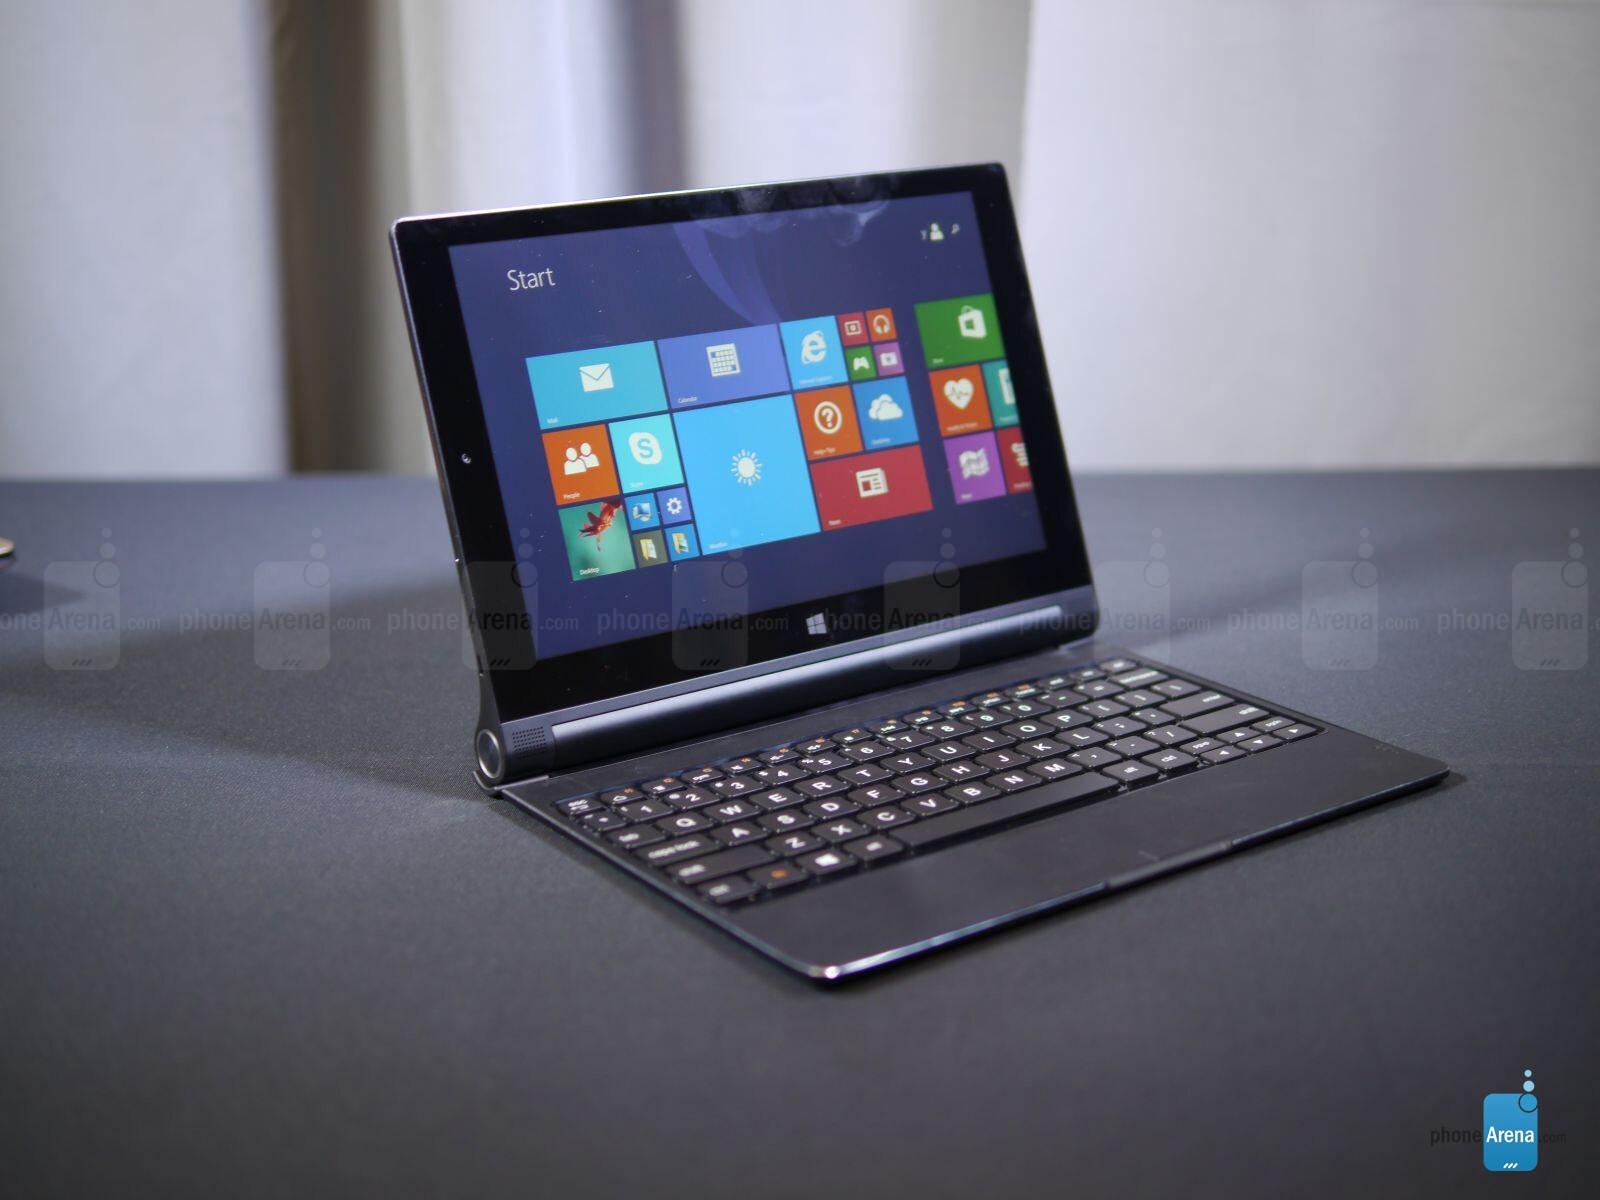 Lenovo: Price points not size make 7-inch tablets popular